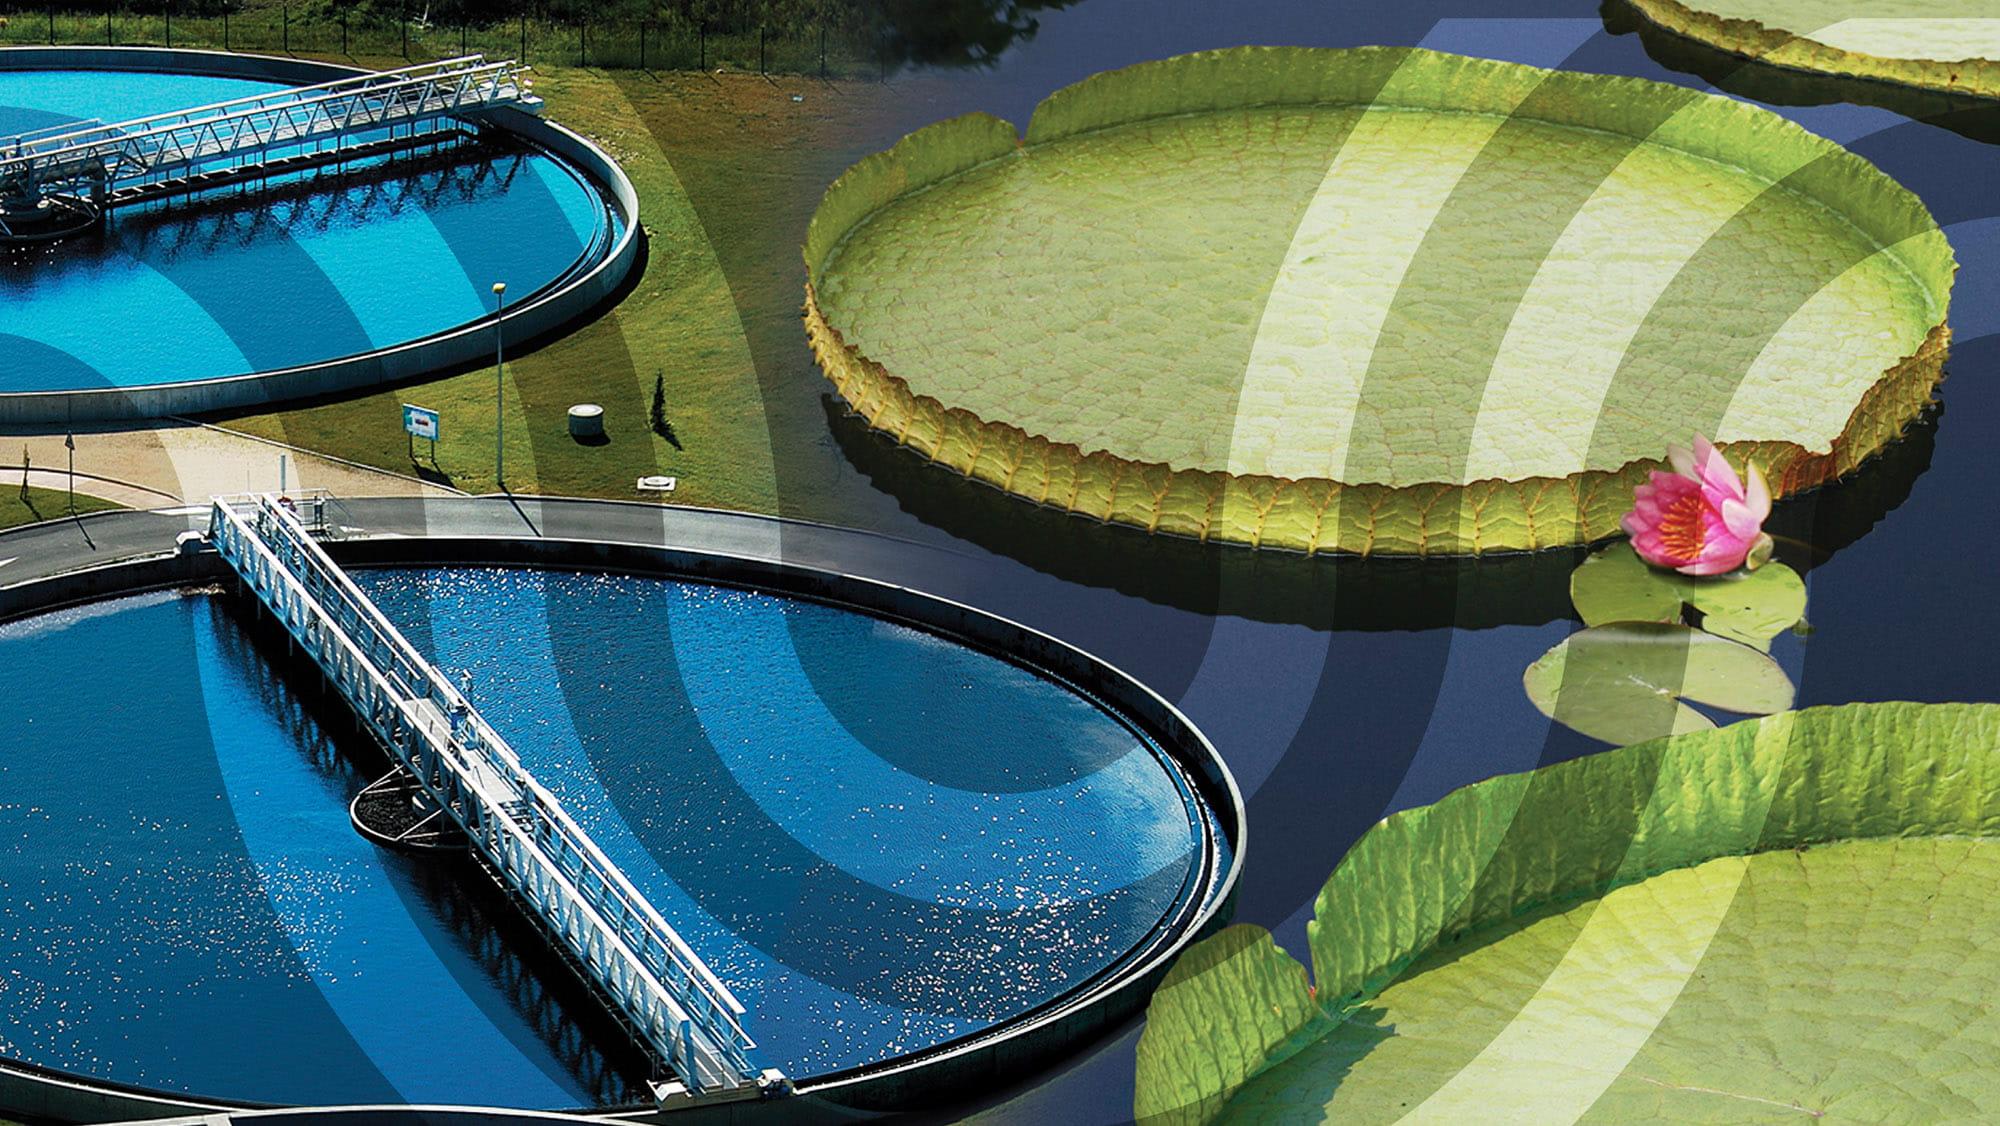 212 water managementout